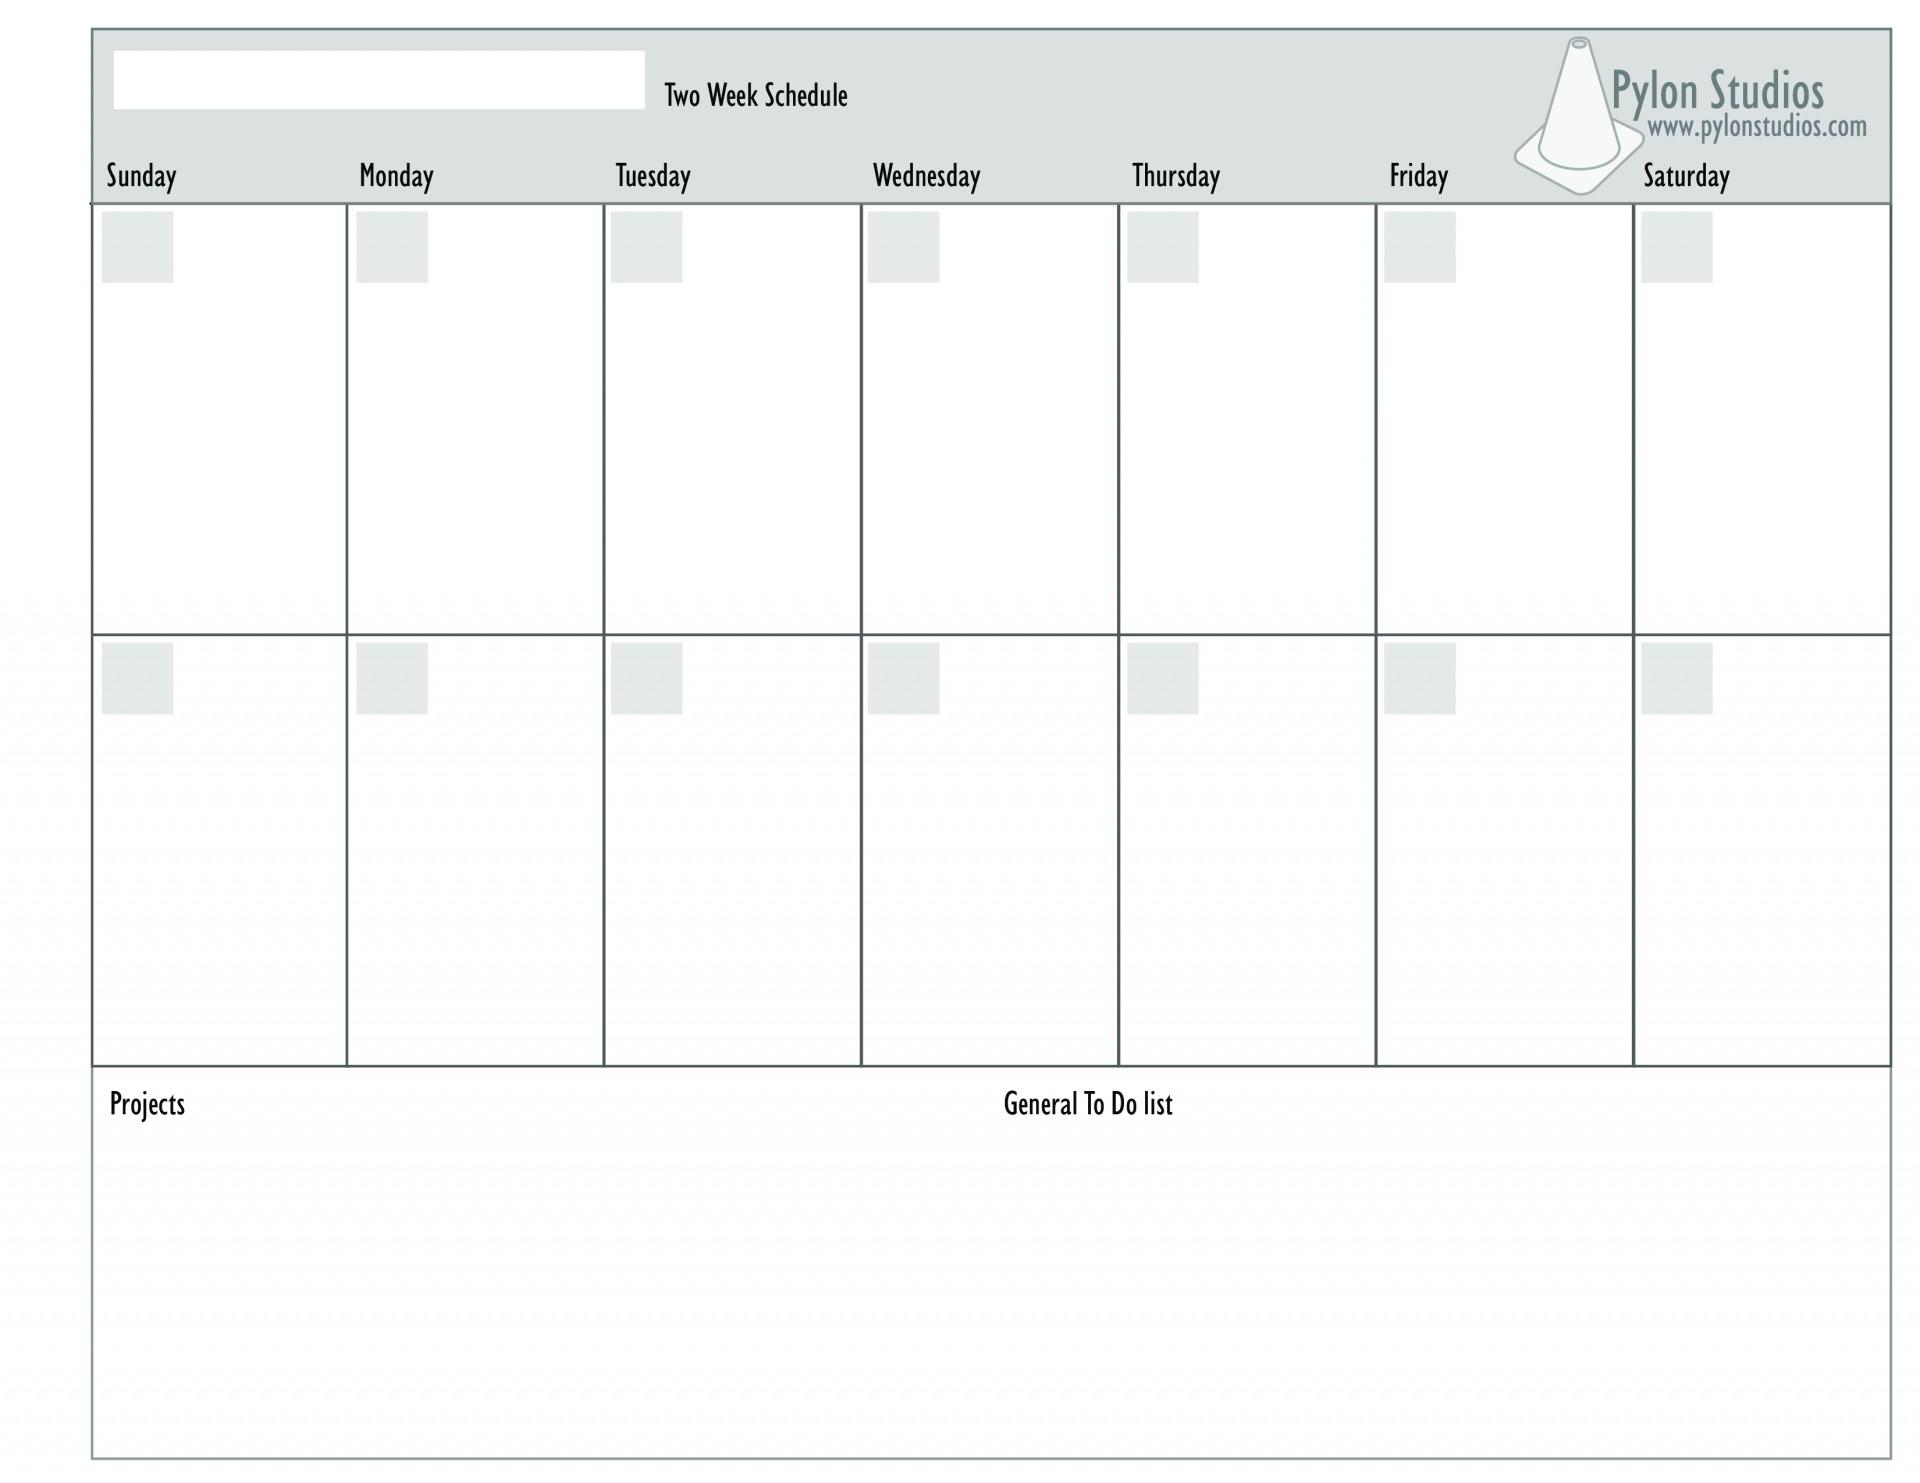 002 Template Ideas Printable Week Calendar For Two-Monday To Friday 2 Week Calendar Template